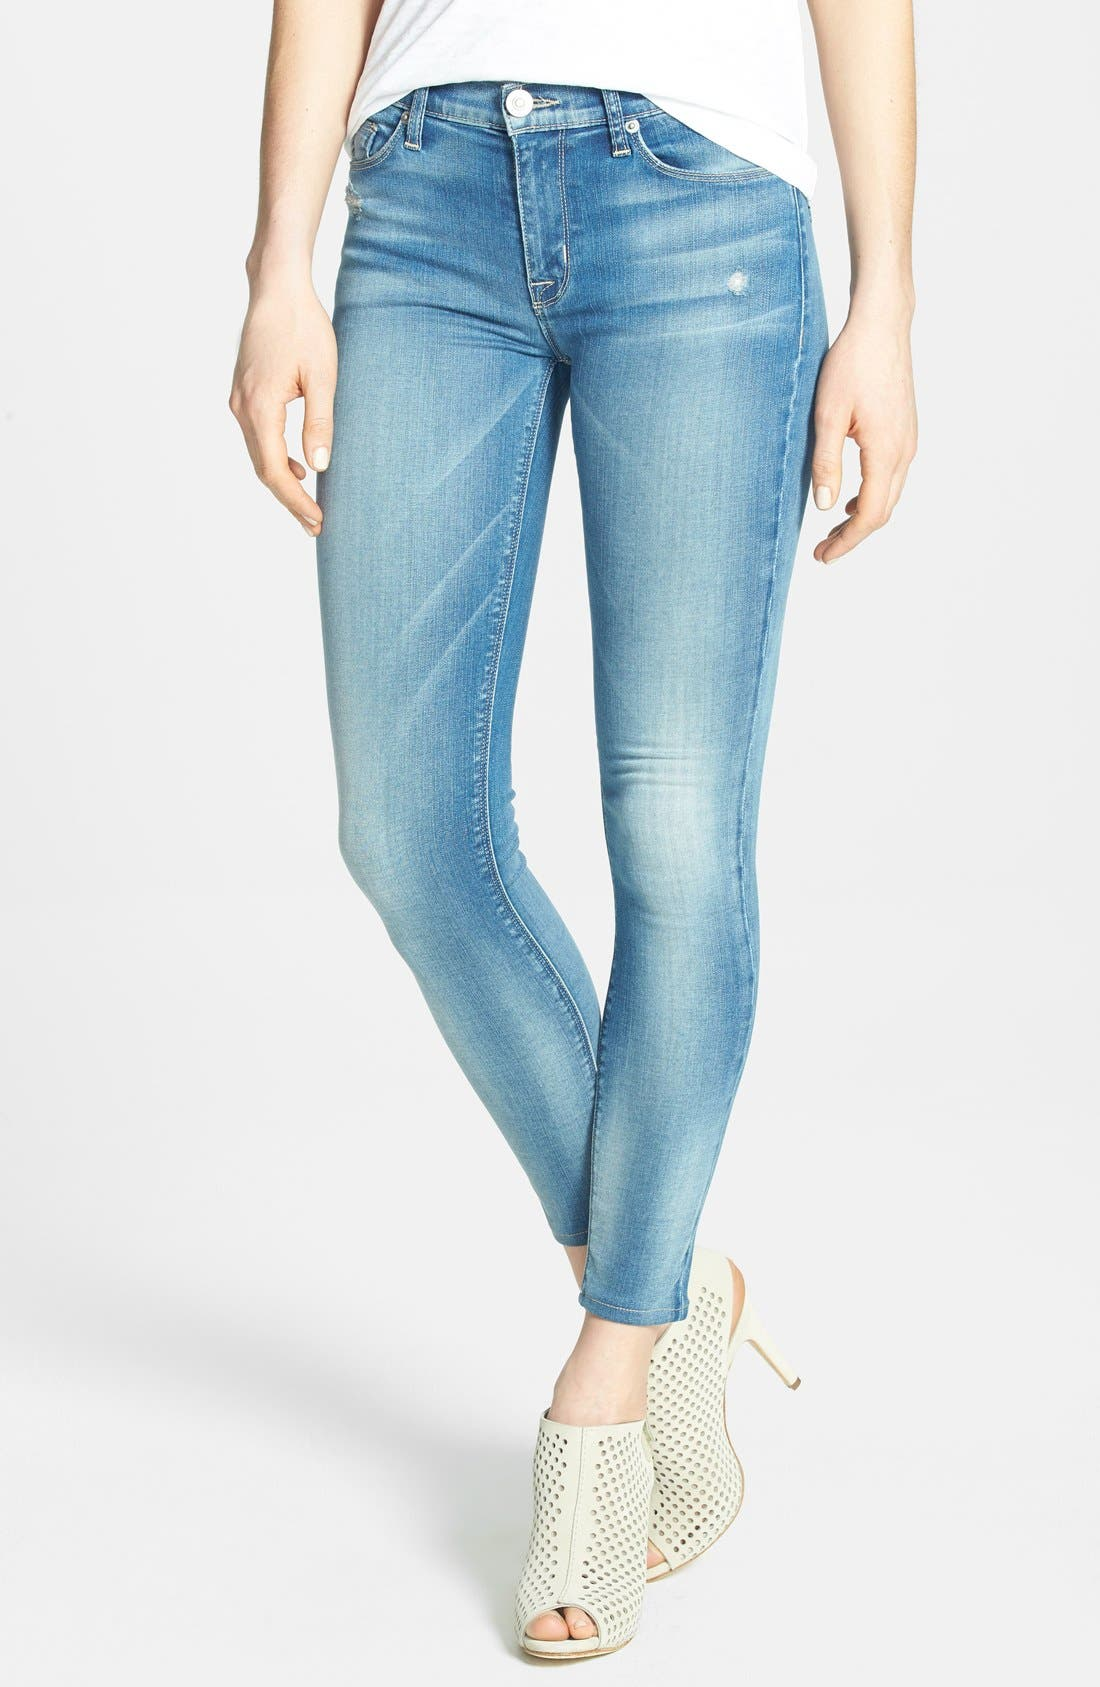 Alternate Image 1 Selected - Hudson Jeans 'Krista' Crop Skinny Jeans (Voodoo Child)